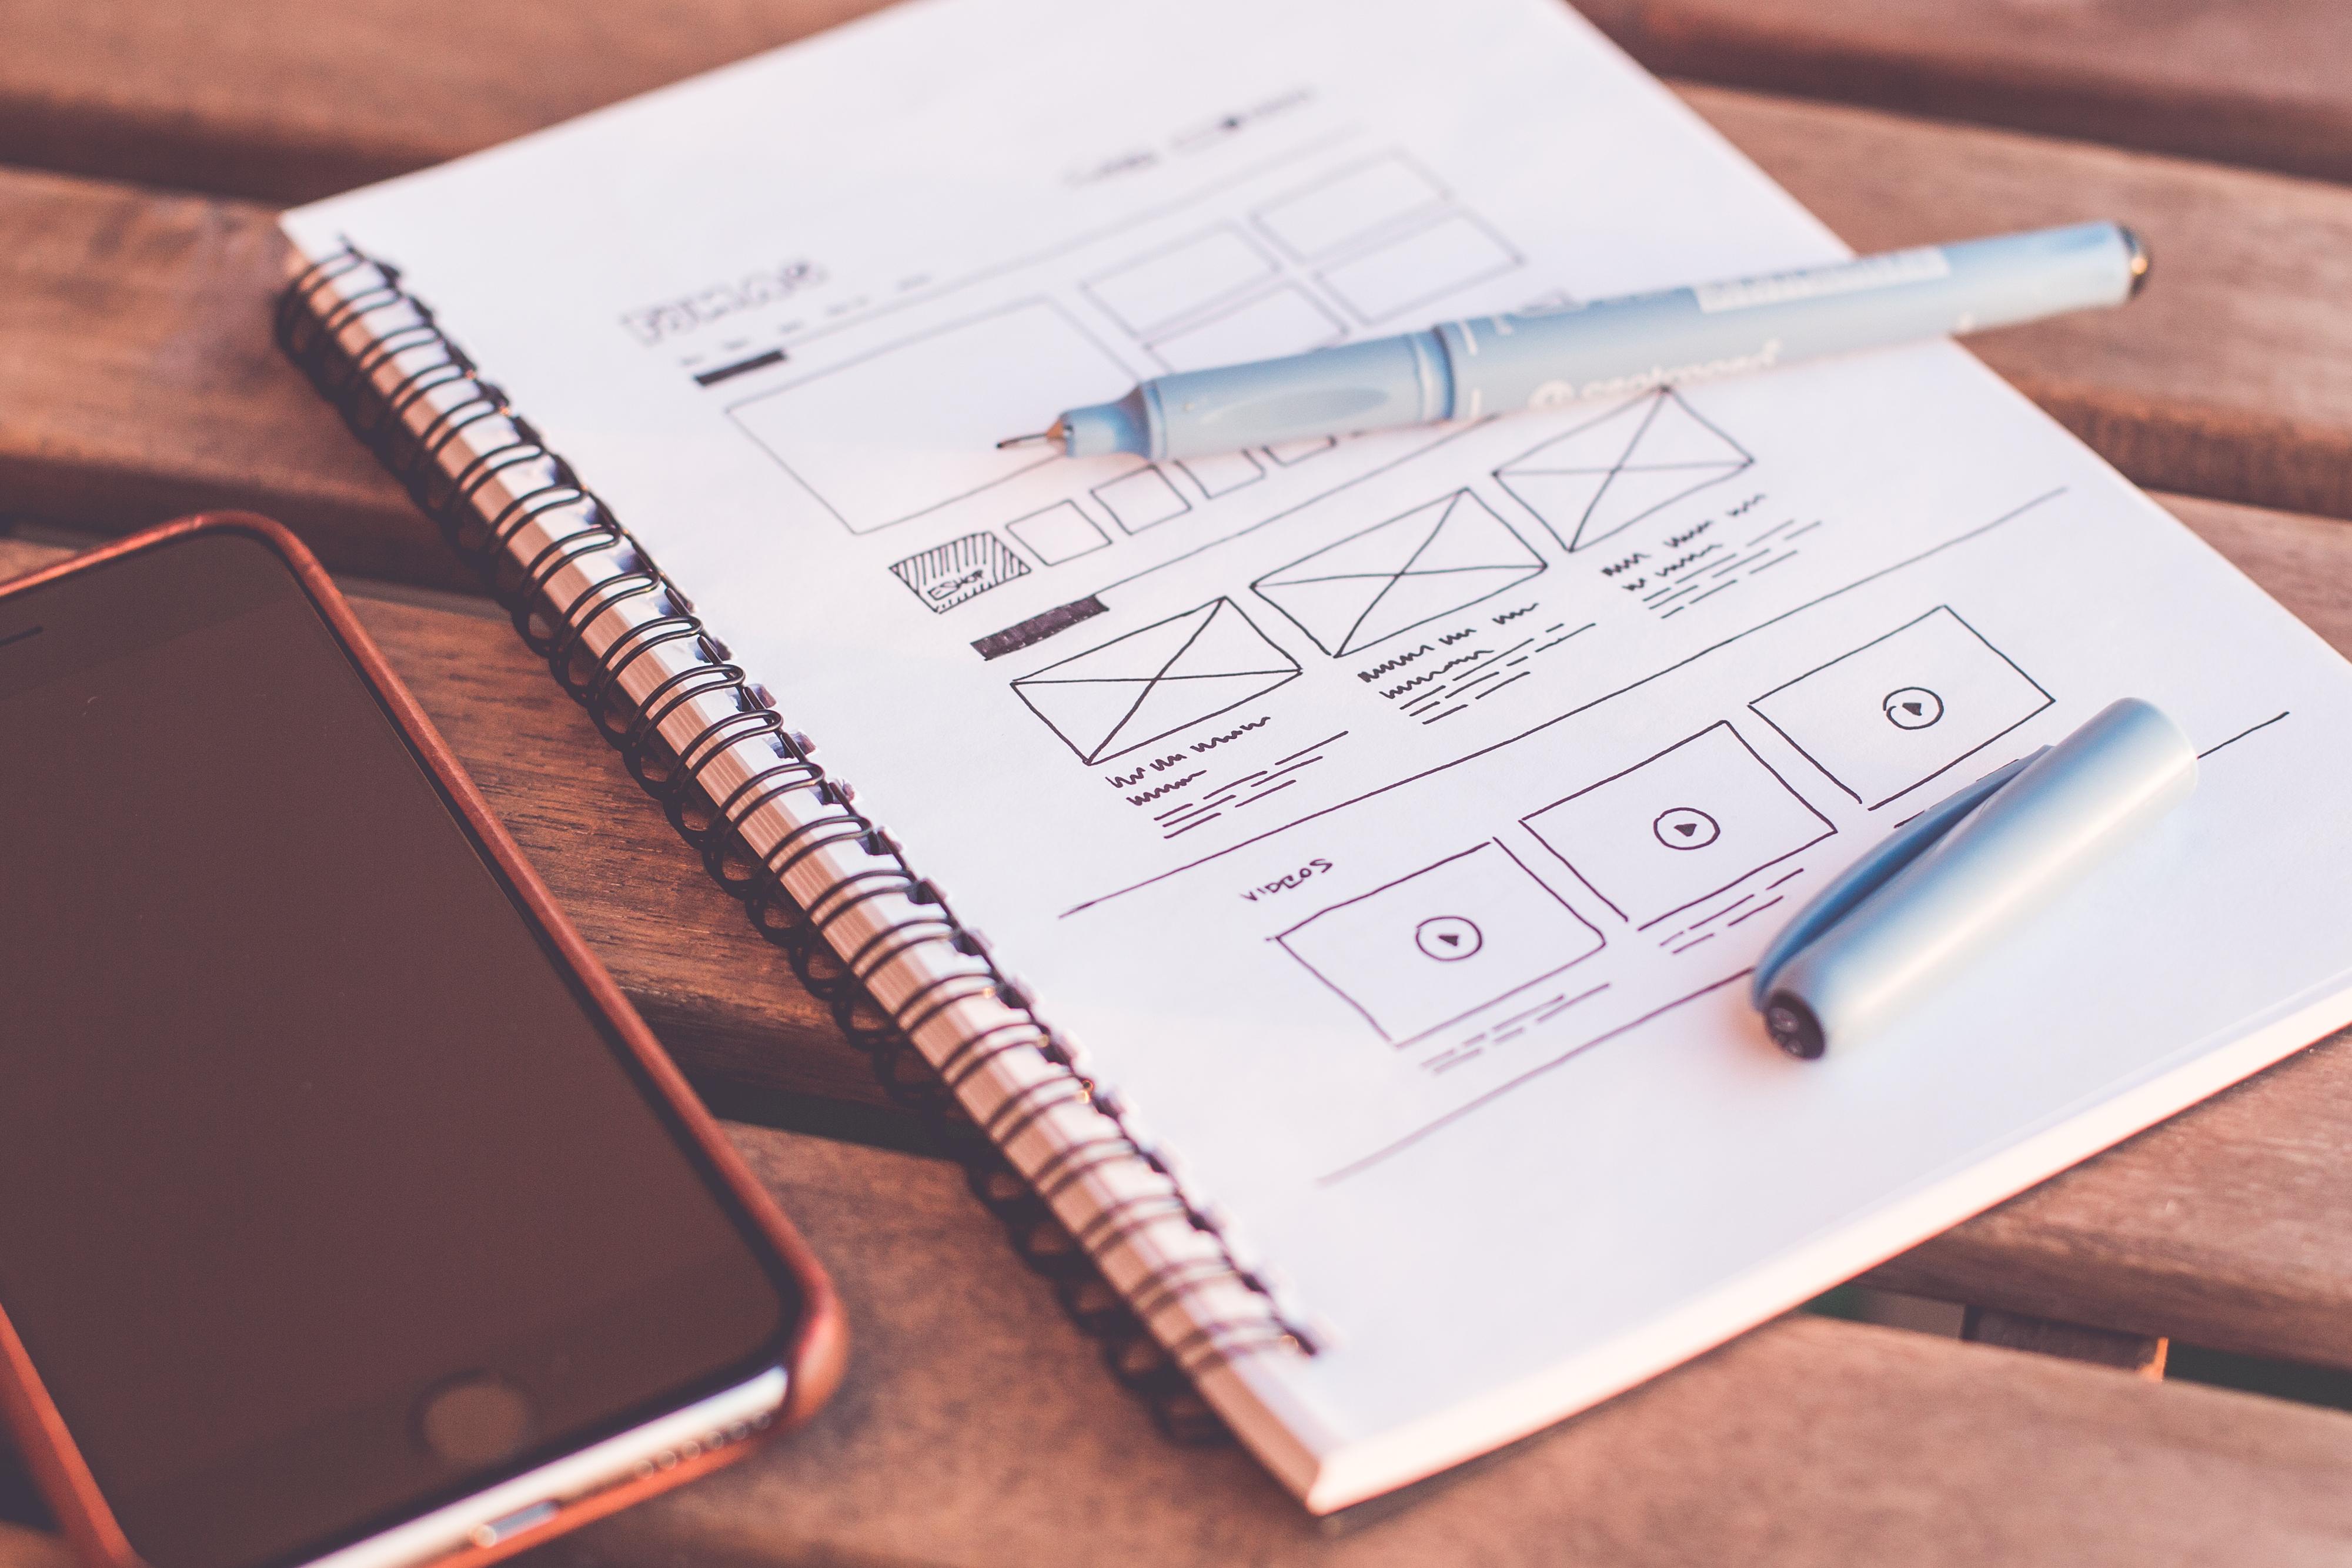 Web design | wireframe